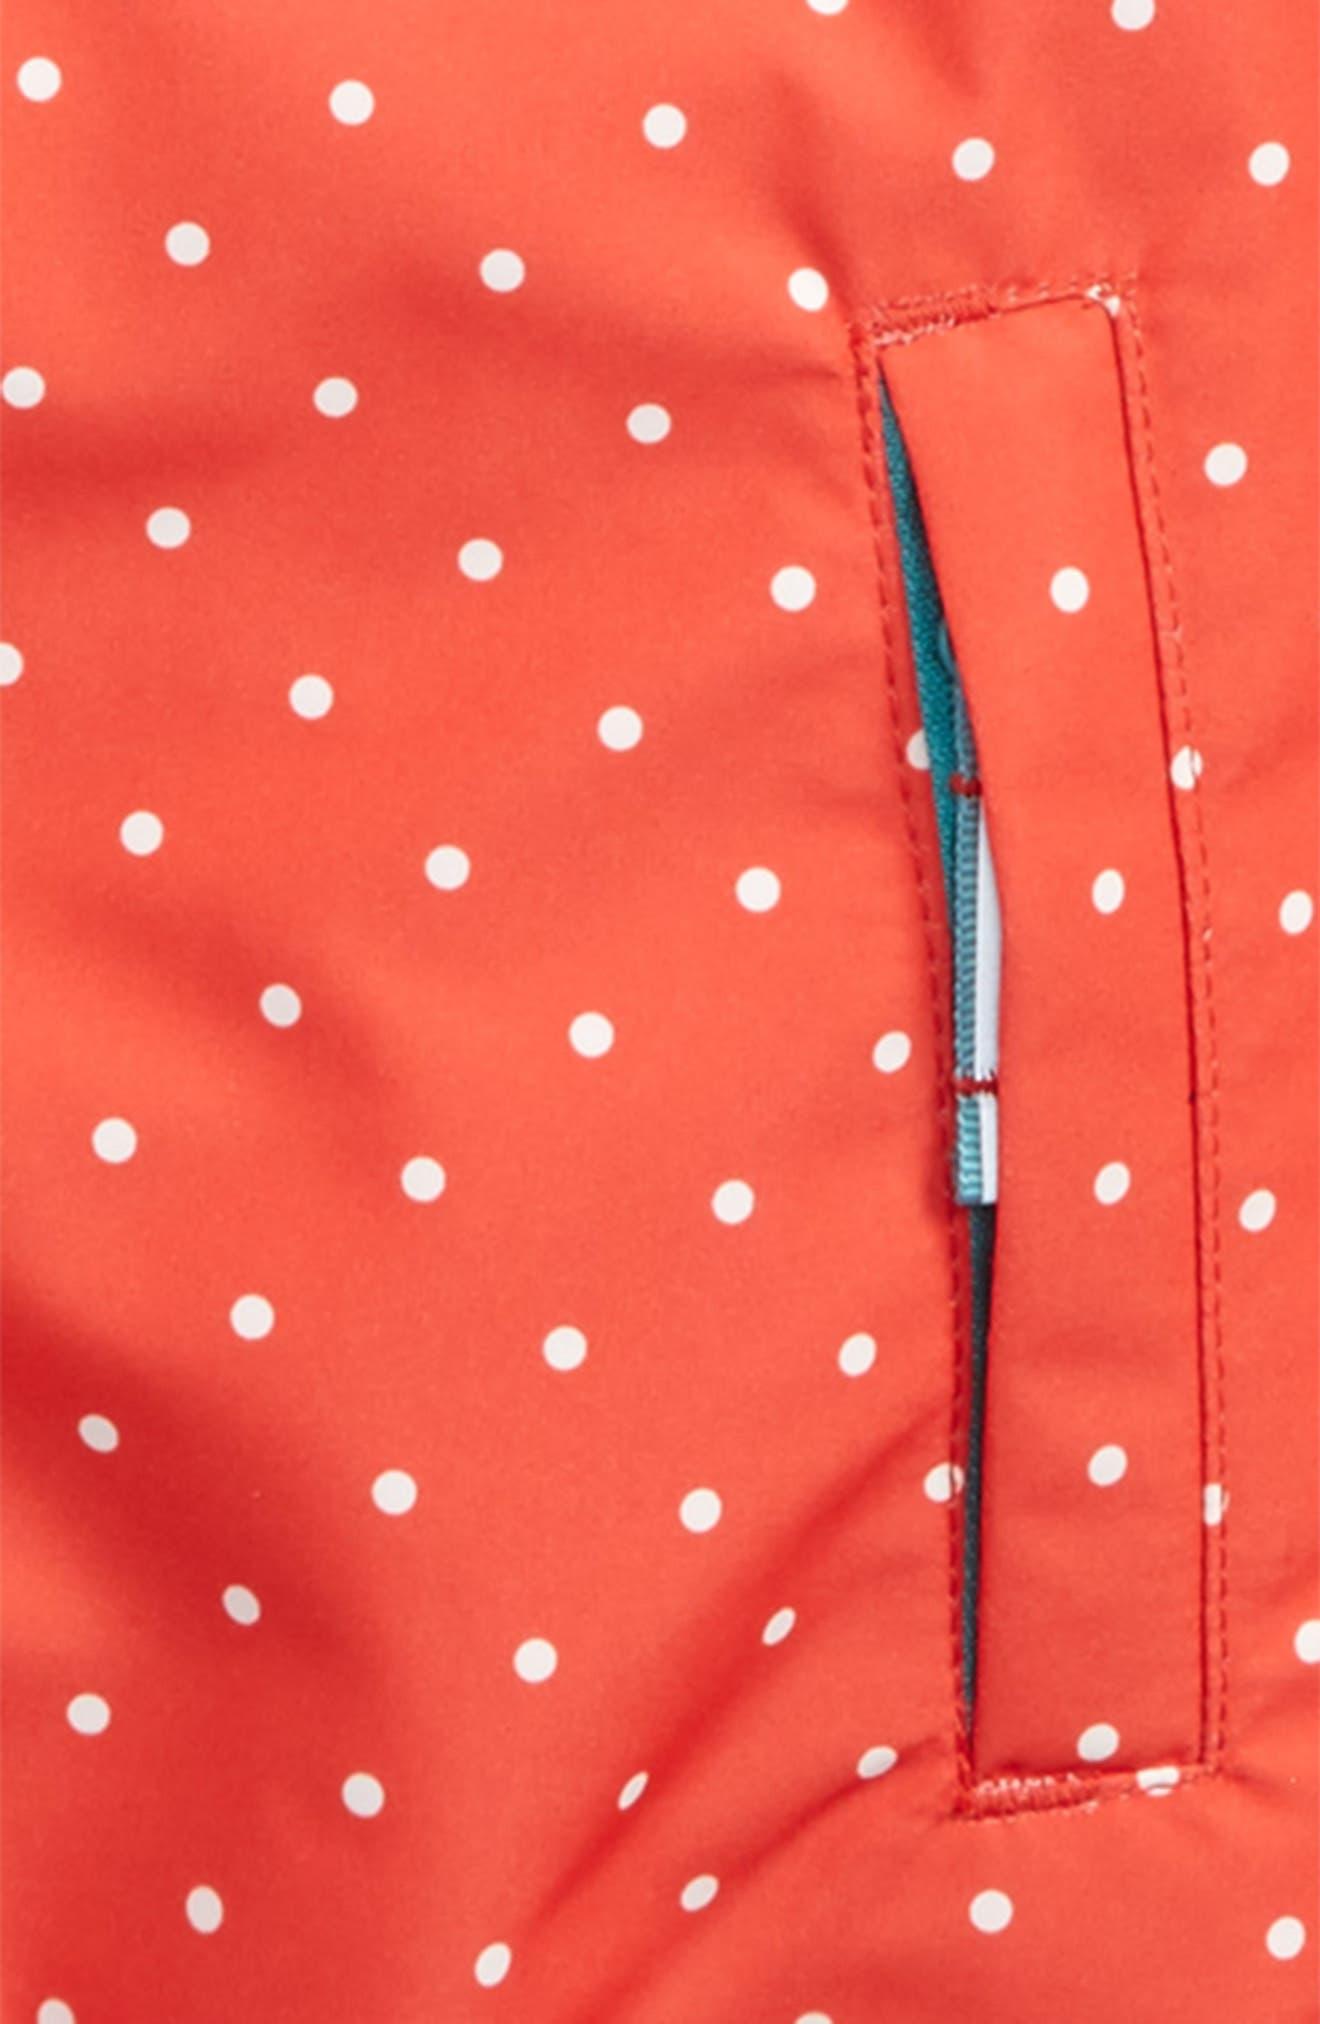 Packaway Waterproof Jacket,                             Alternate thumbnail 3, color,                             Red Jam Pin Spot